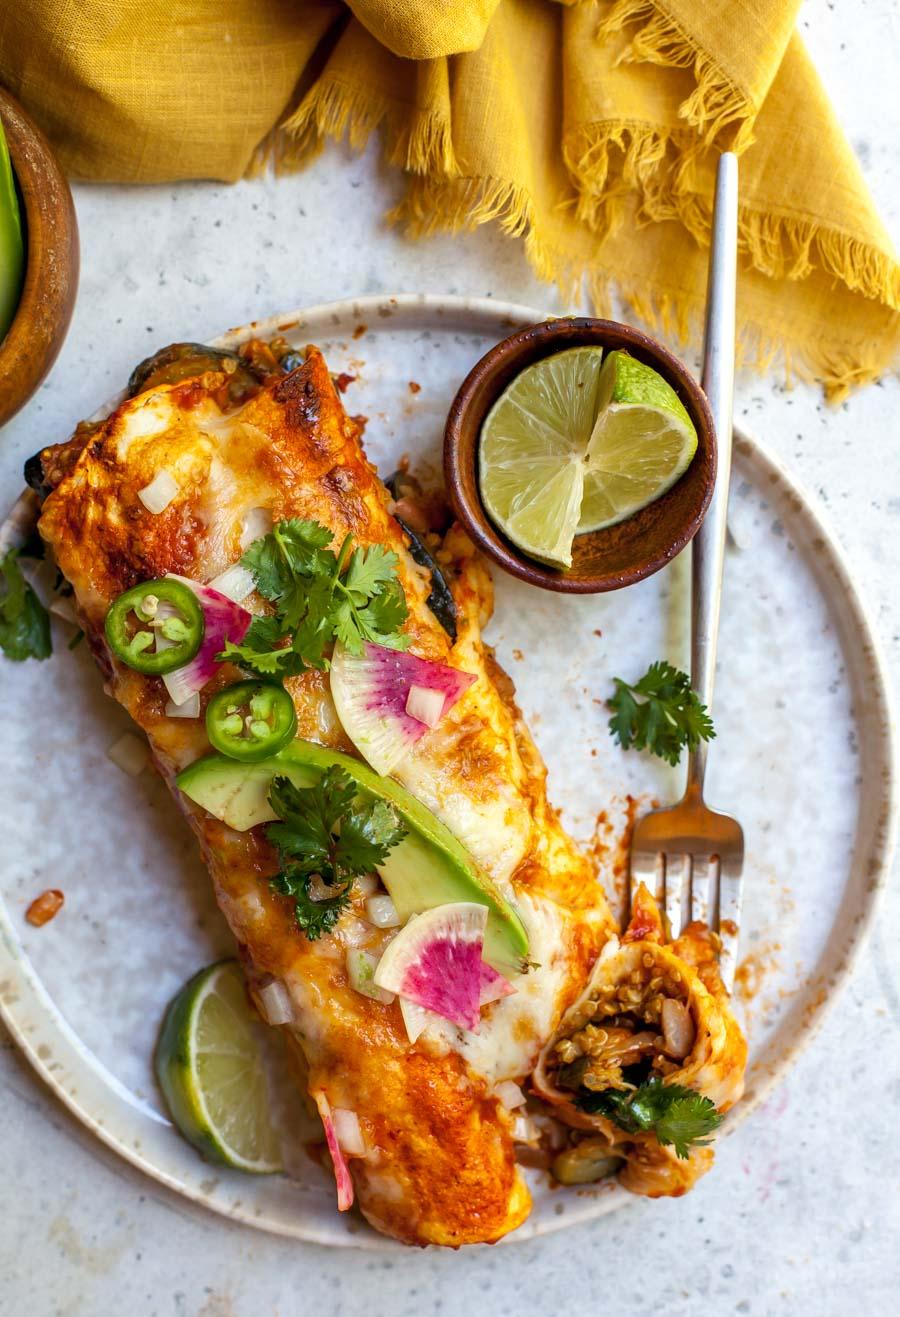 Single portion of enchiladas with garnishes